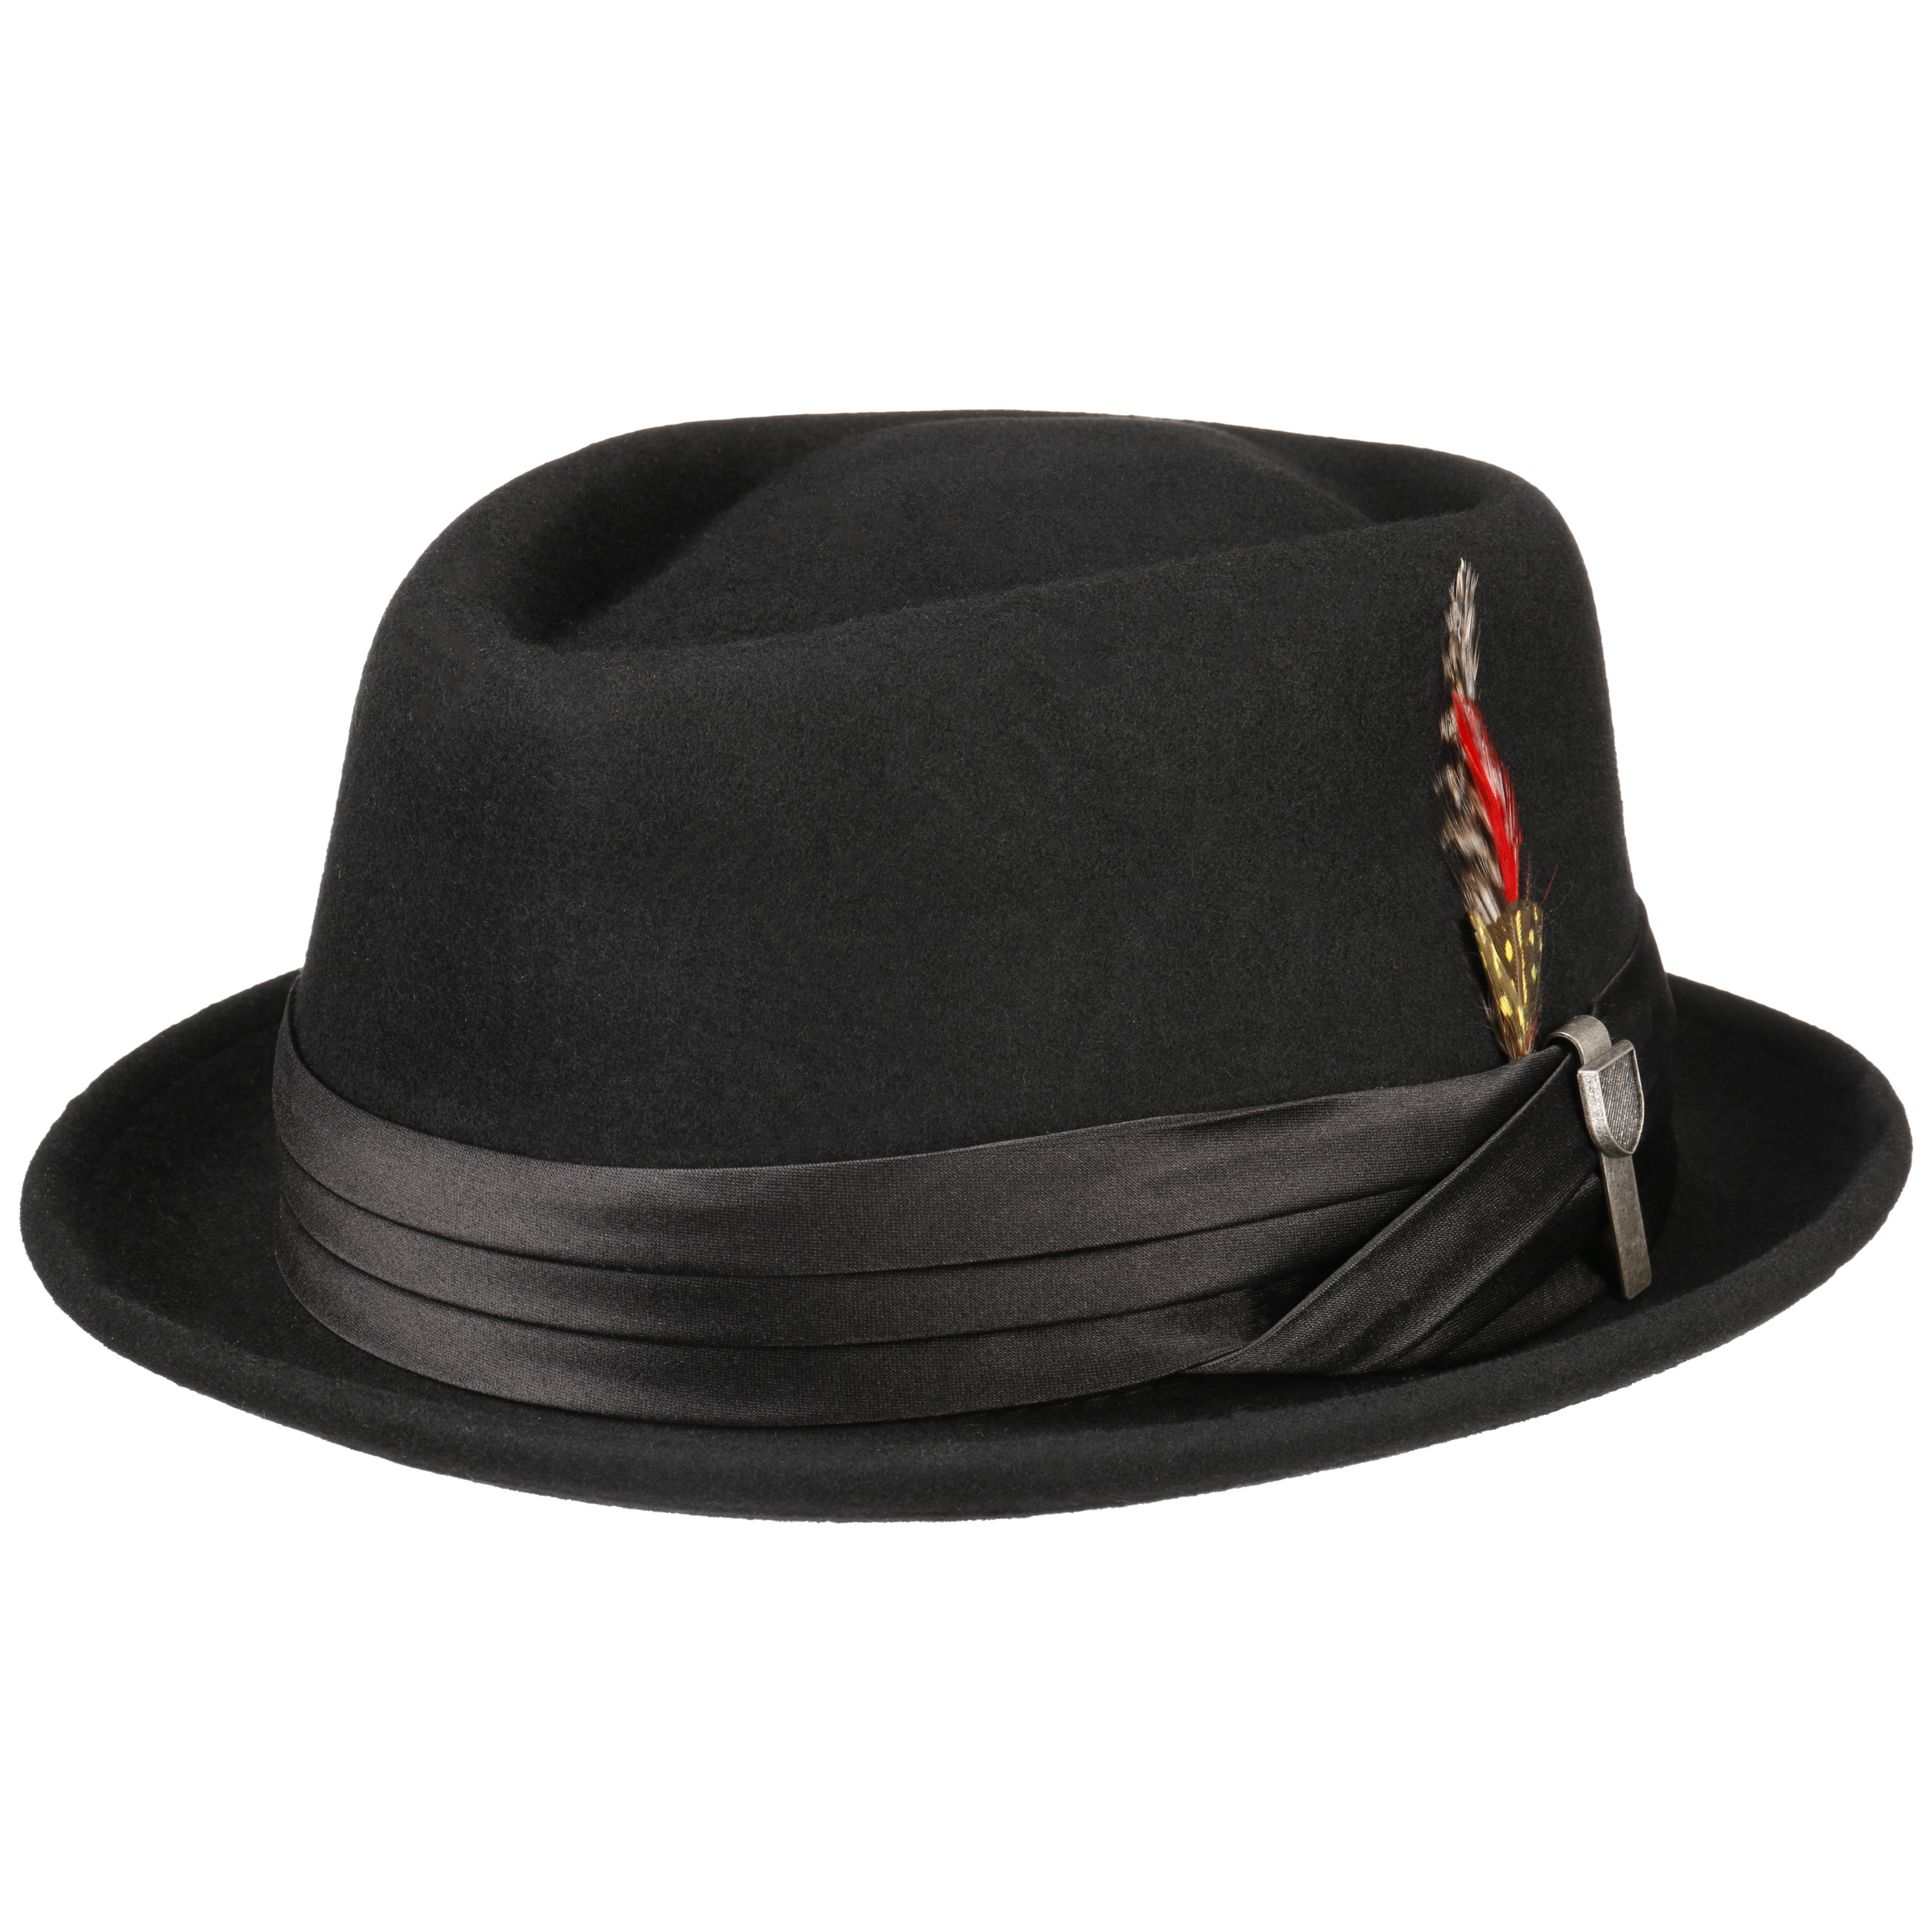 218025bbc88 ... Stout Pork Pie Wool Felt Hat by Brixton - black 7 ...